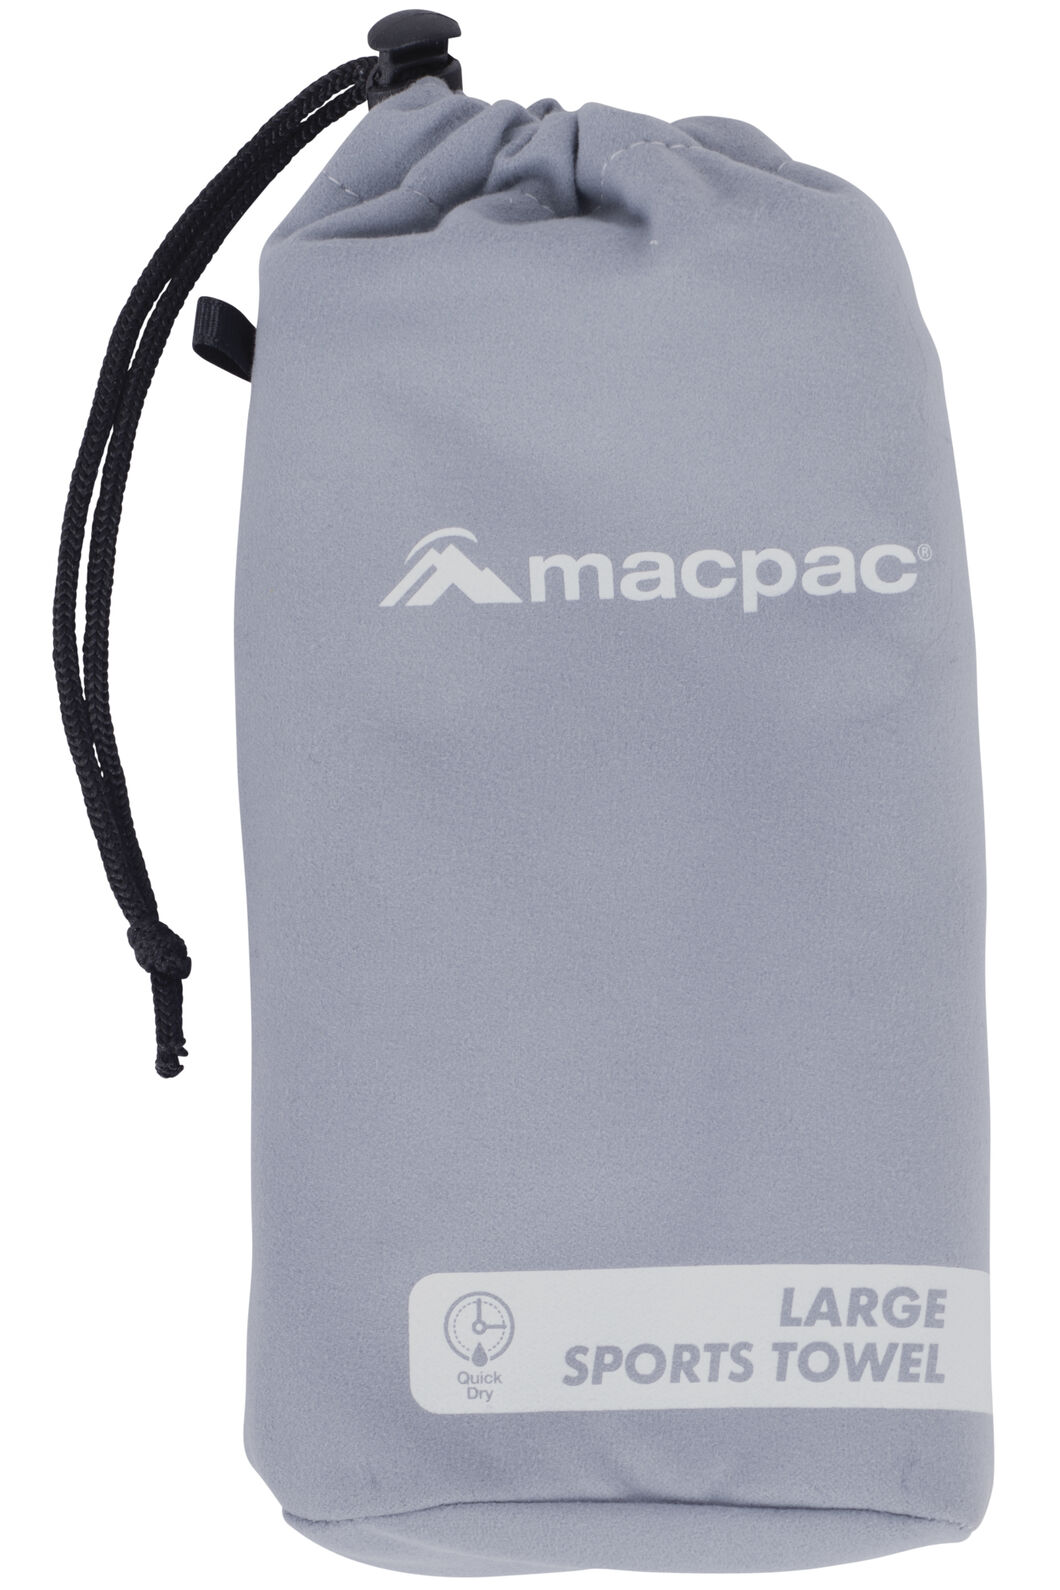 Macpac Sports Towel Large, Charcoal, hi-res